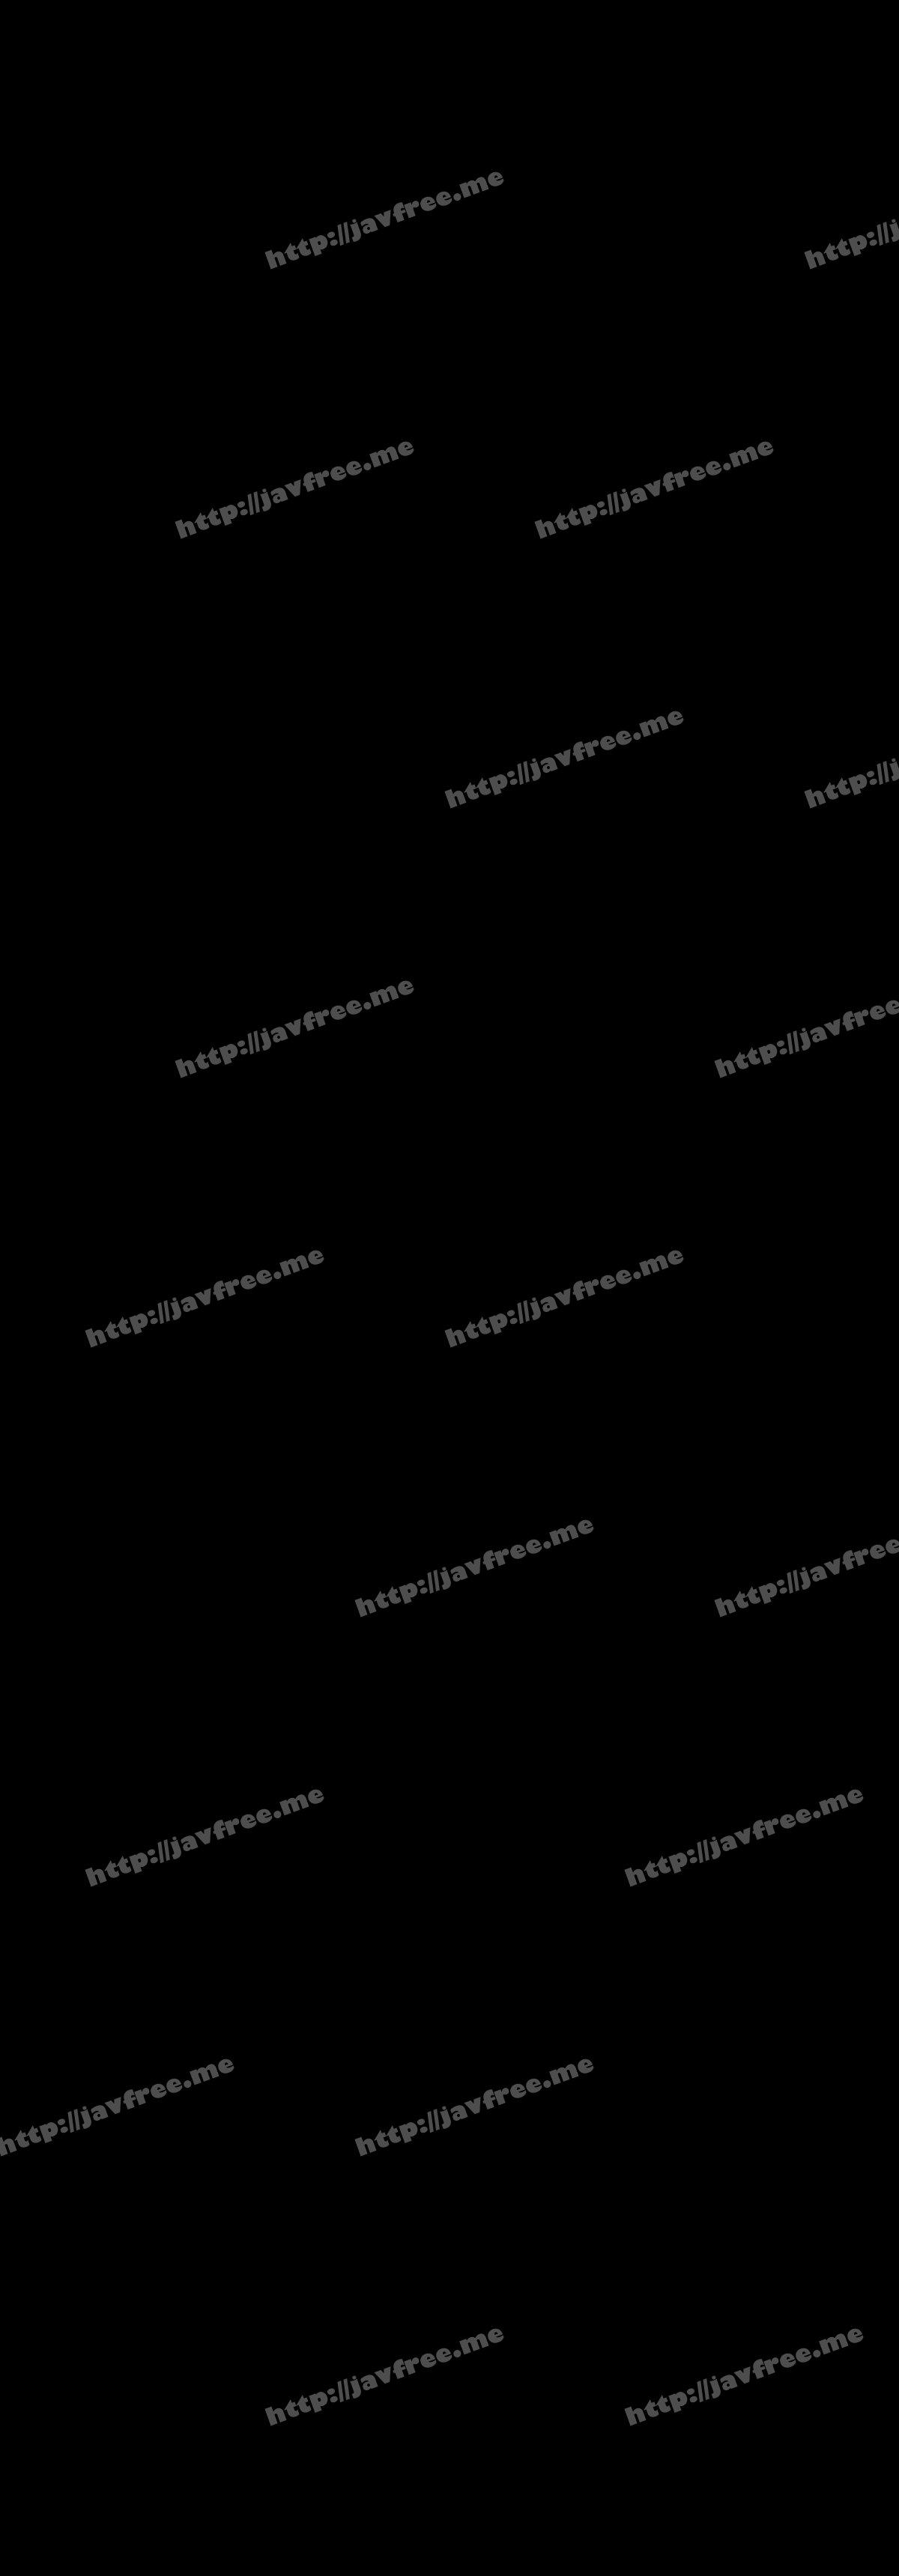 [HD][FIV-077] 軟派の神髄。 3 全員爆乳SP ワンナイトは当たり前!?イマドキ女子のエロすぎる性事情を暴く! - image FIV-077-1080p on https://javfree.me